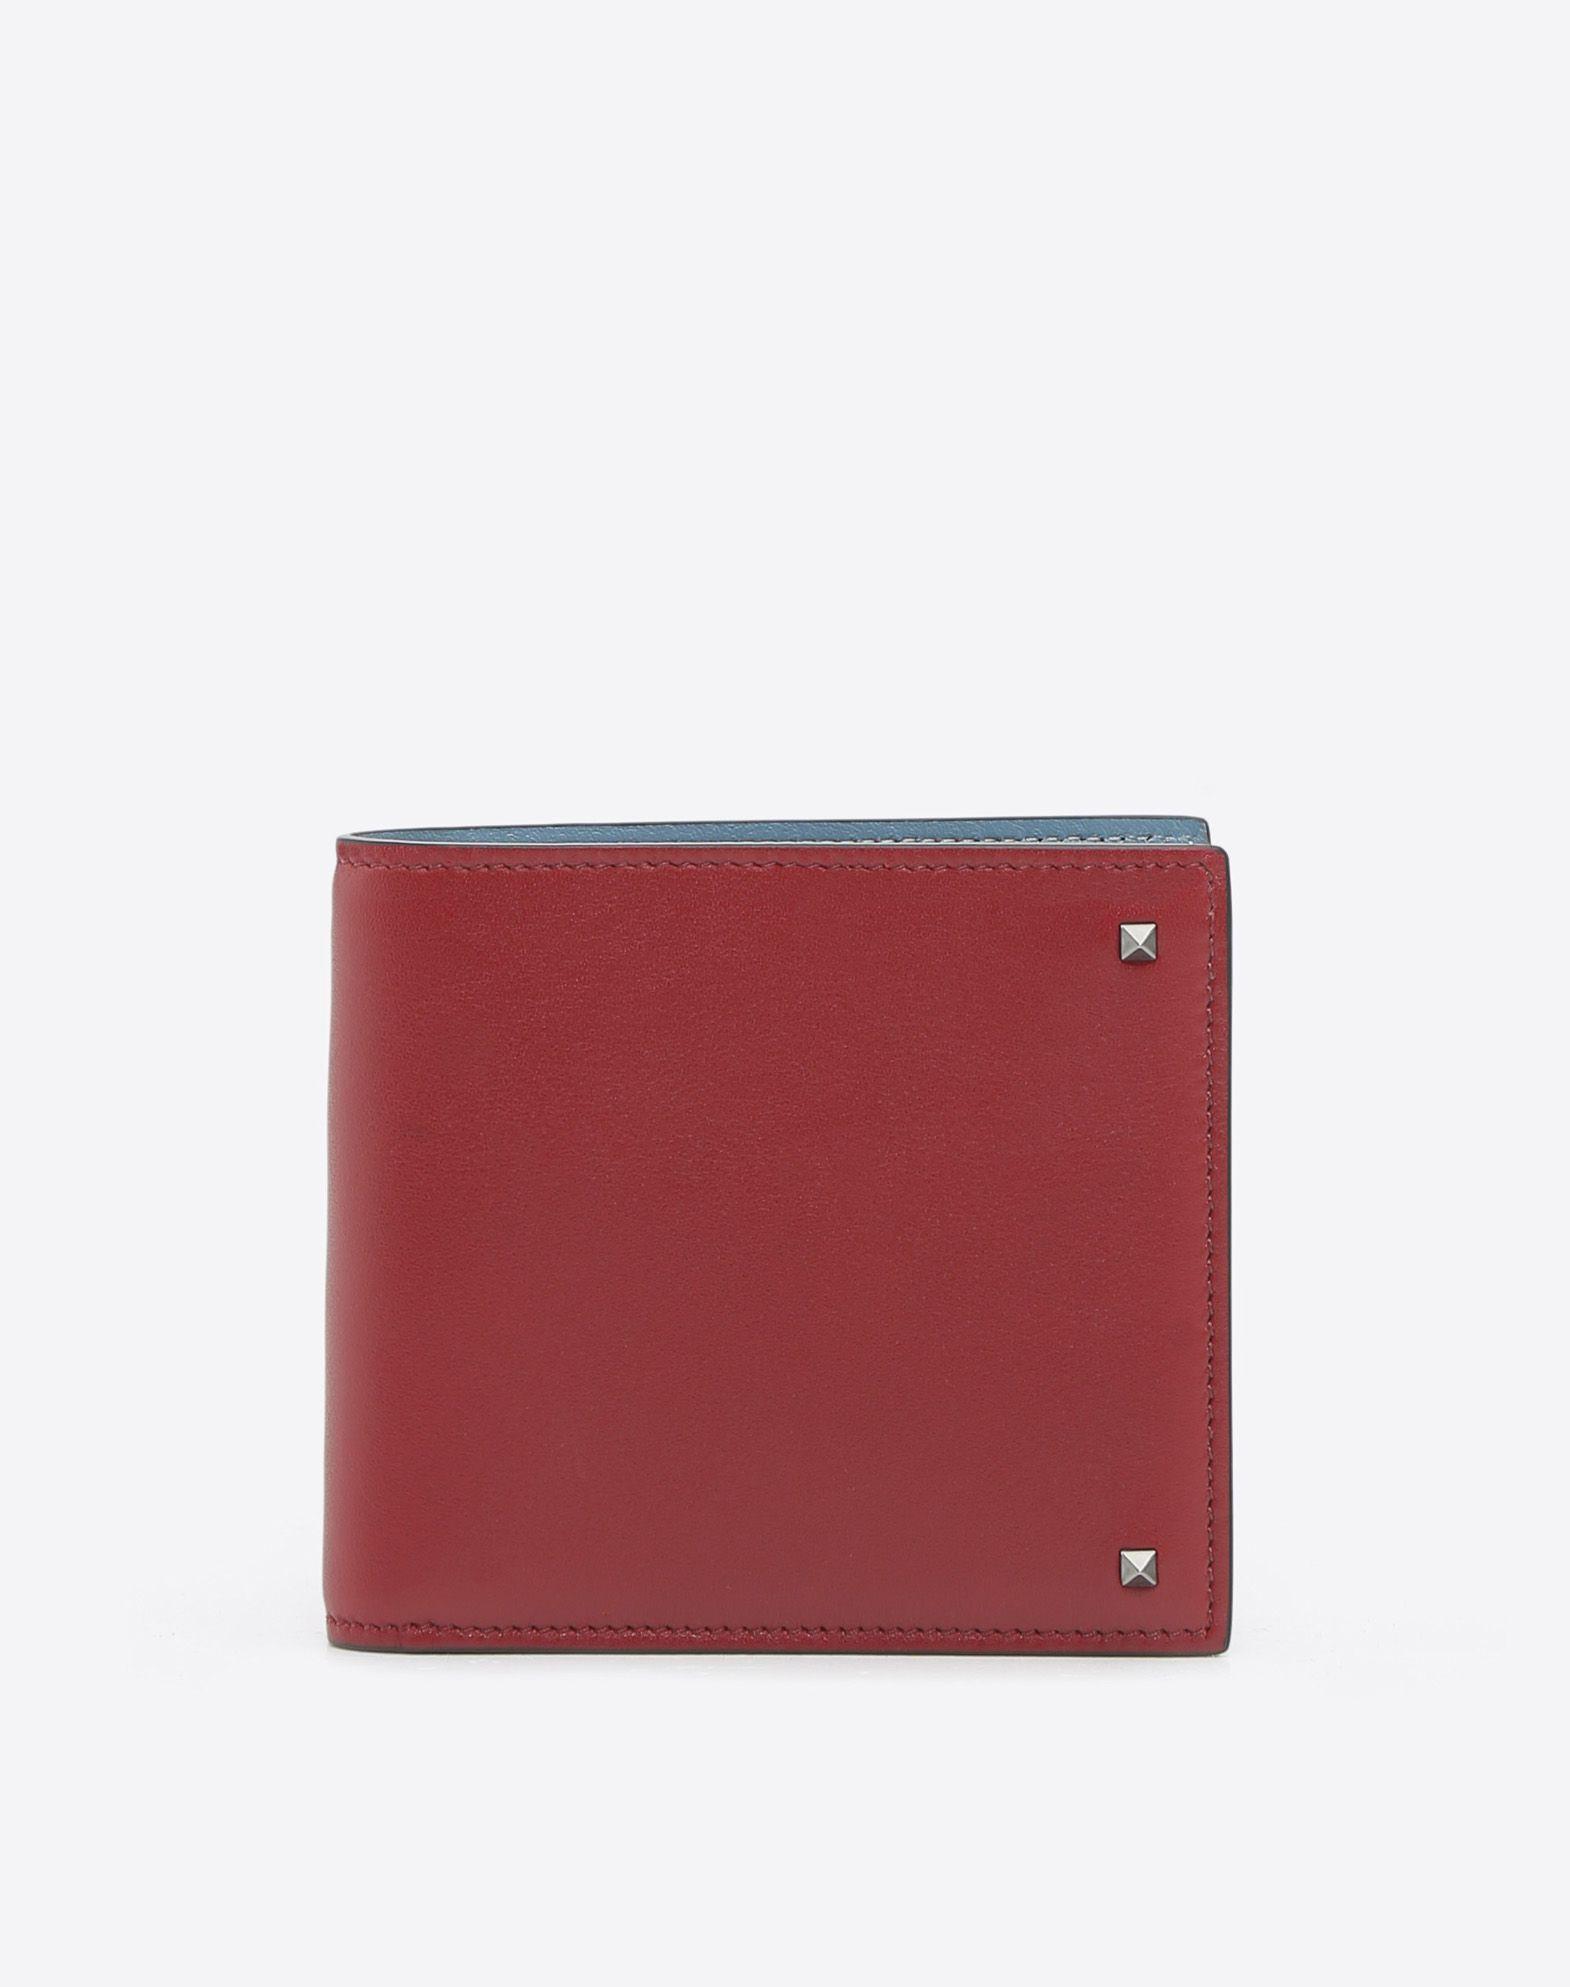 VALENTINO GARAVANI UOMO Rockstud Billfold Wallet COMPACT WALLETS U f